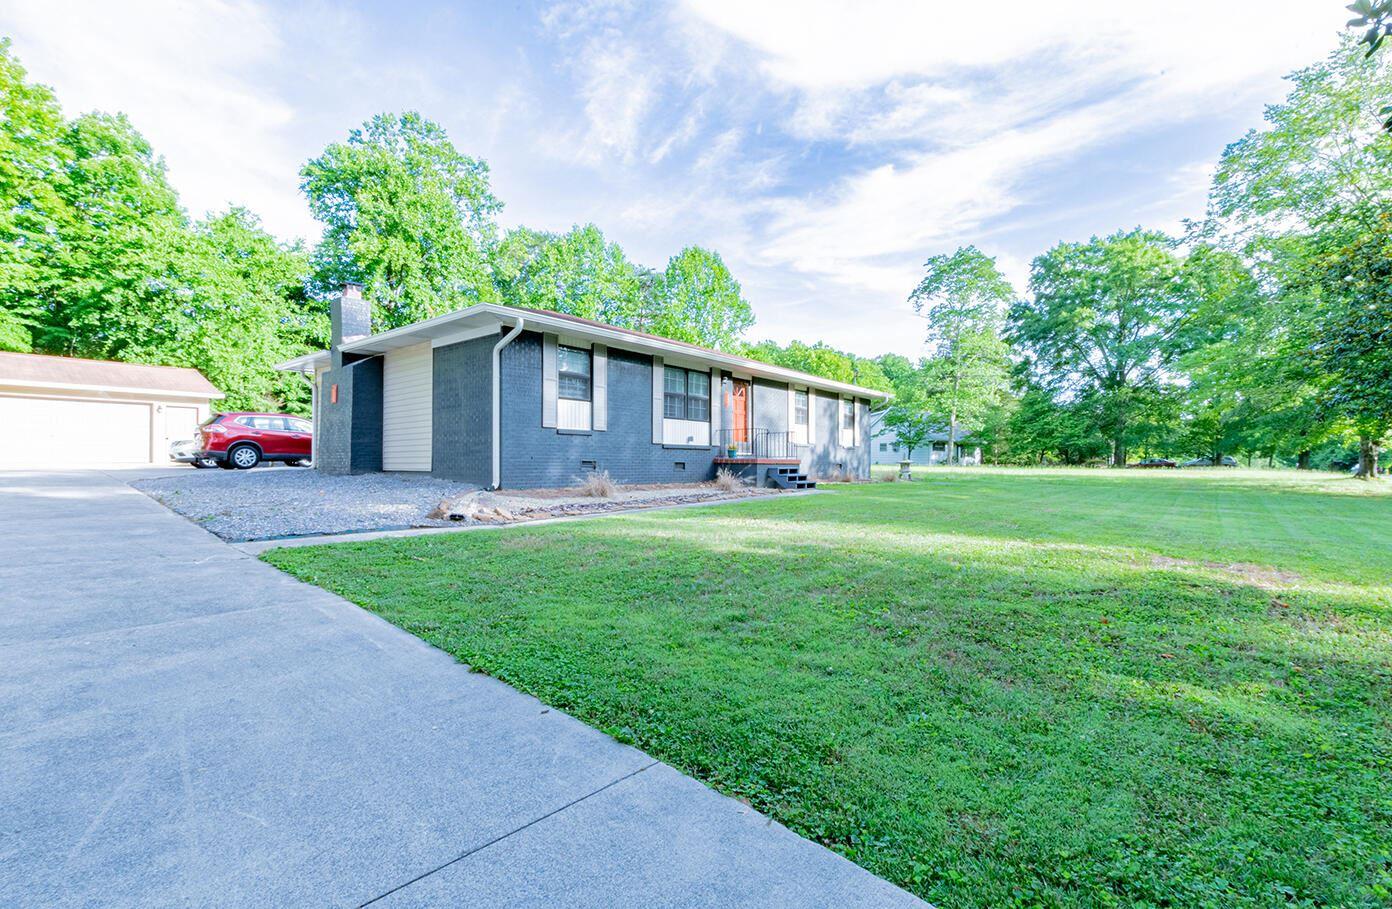 Photo of 116 Culver Rd, Oak Ridge, TN 37830 (MLS # 1156013)